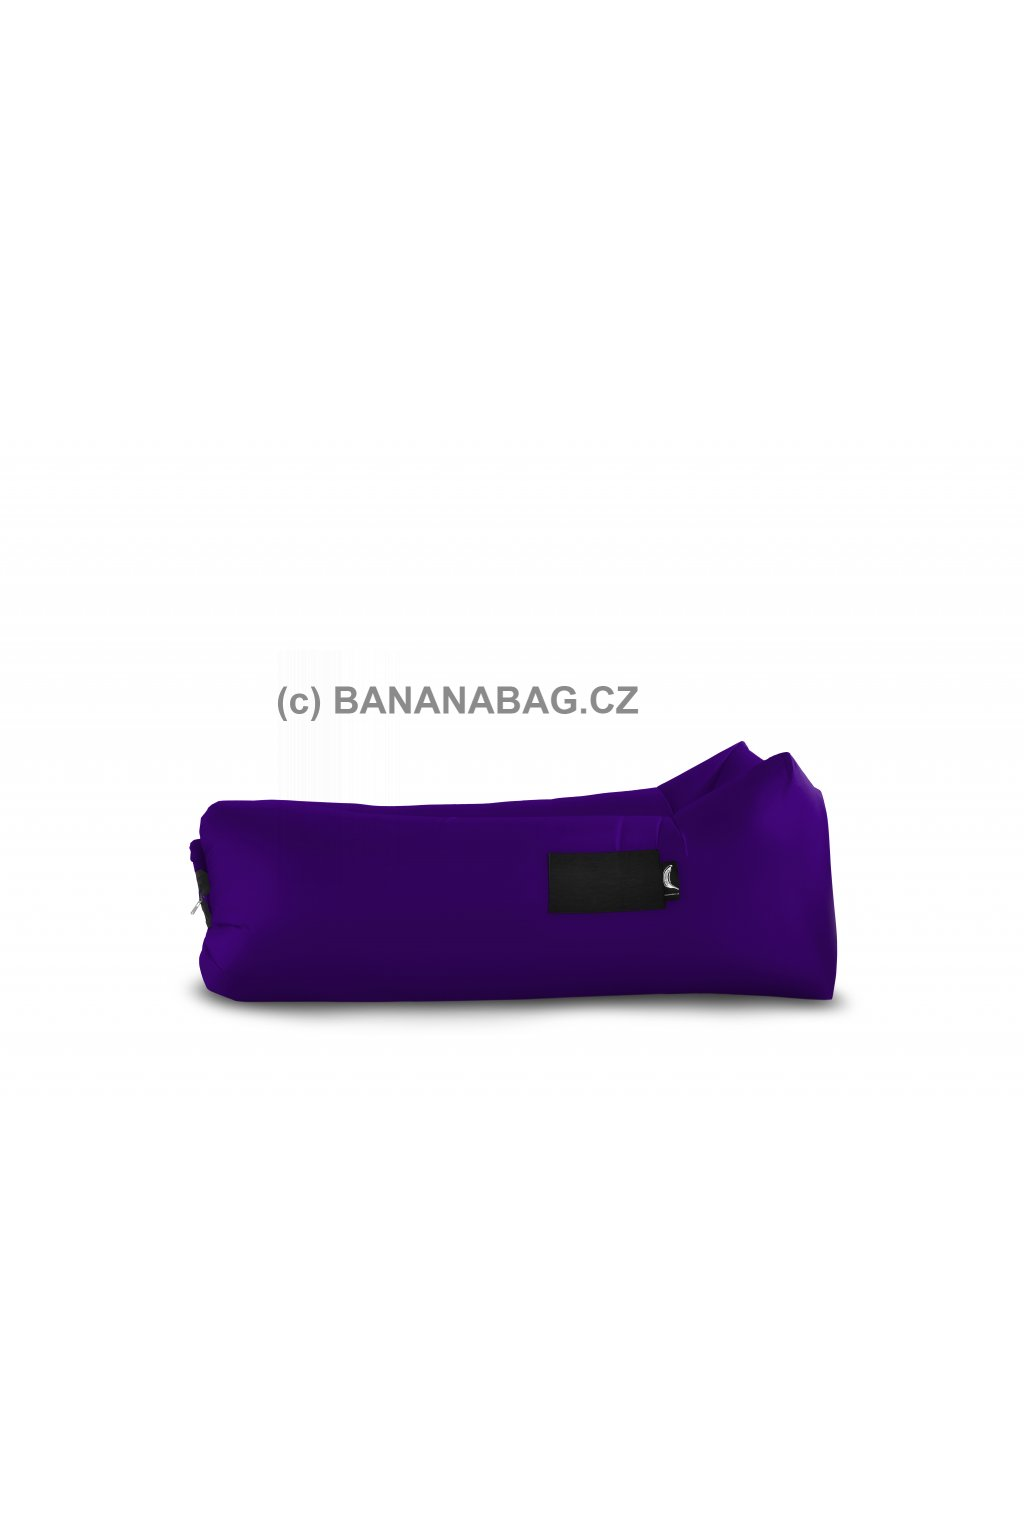 Bananabag NYLON NANO 2019 tmavě modrý/tmavě fialový